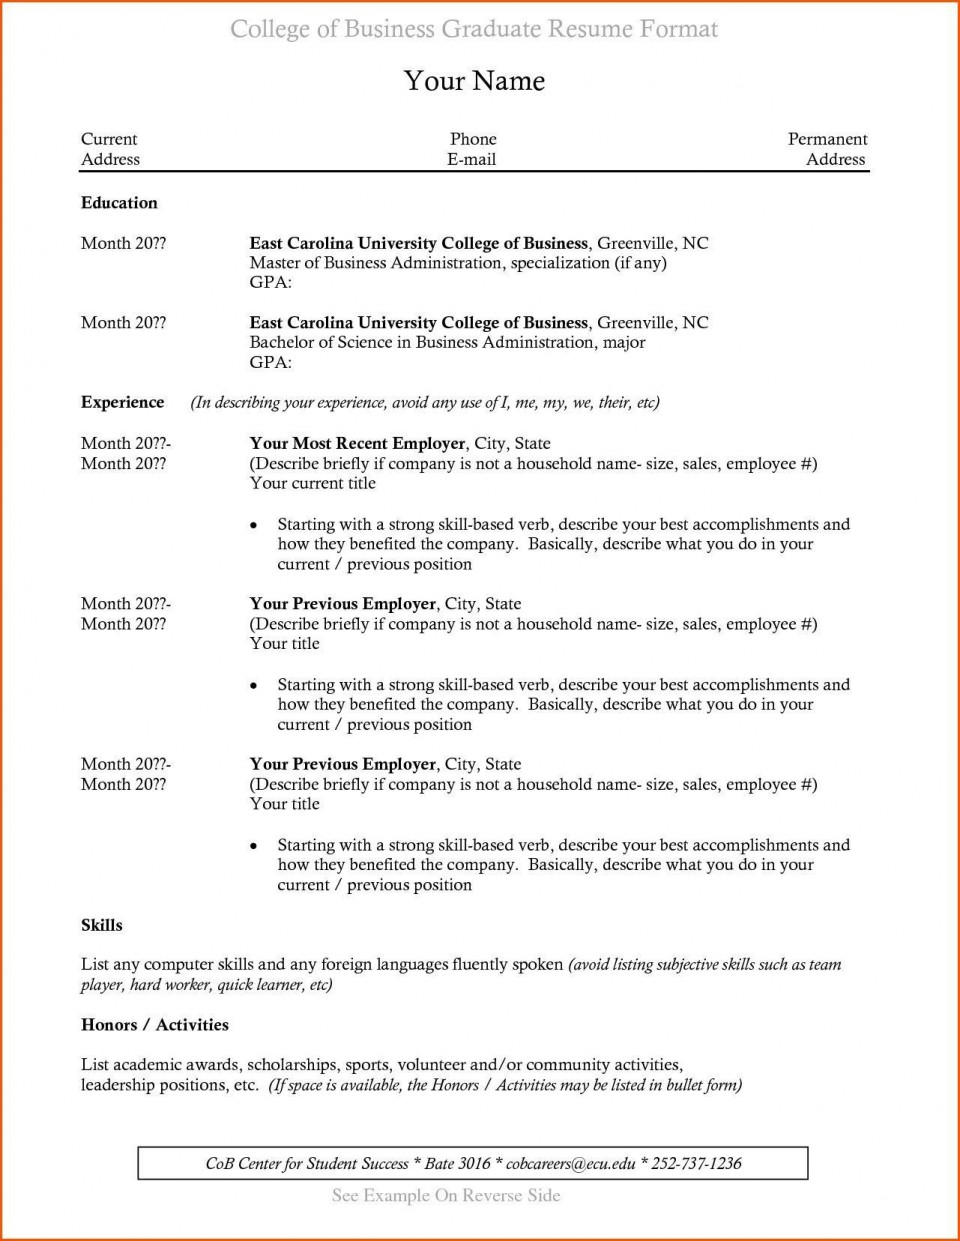 003 Incredible Recent College Graduate Resume Template Sample  Word960